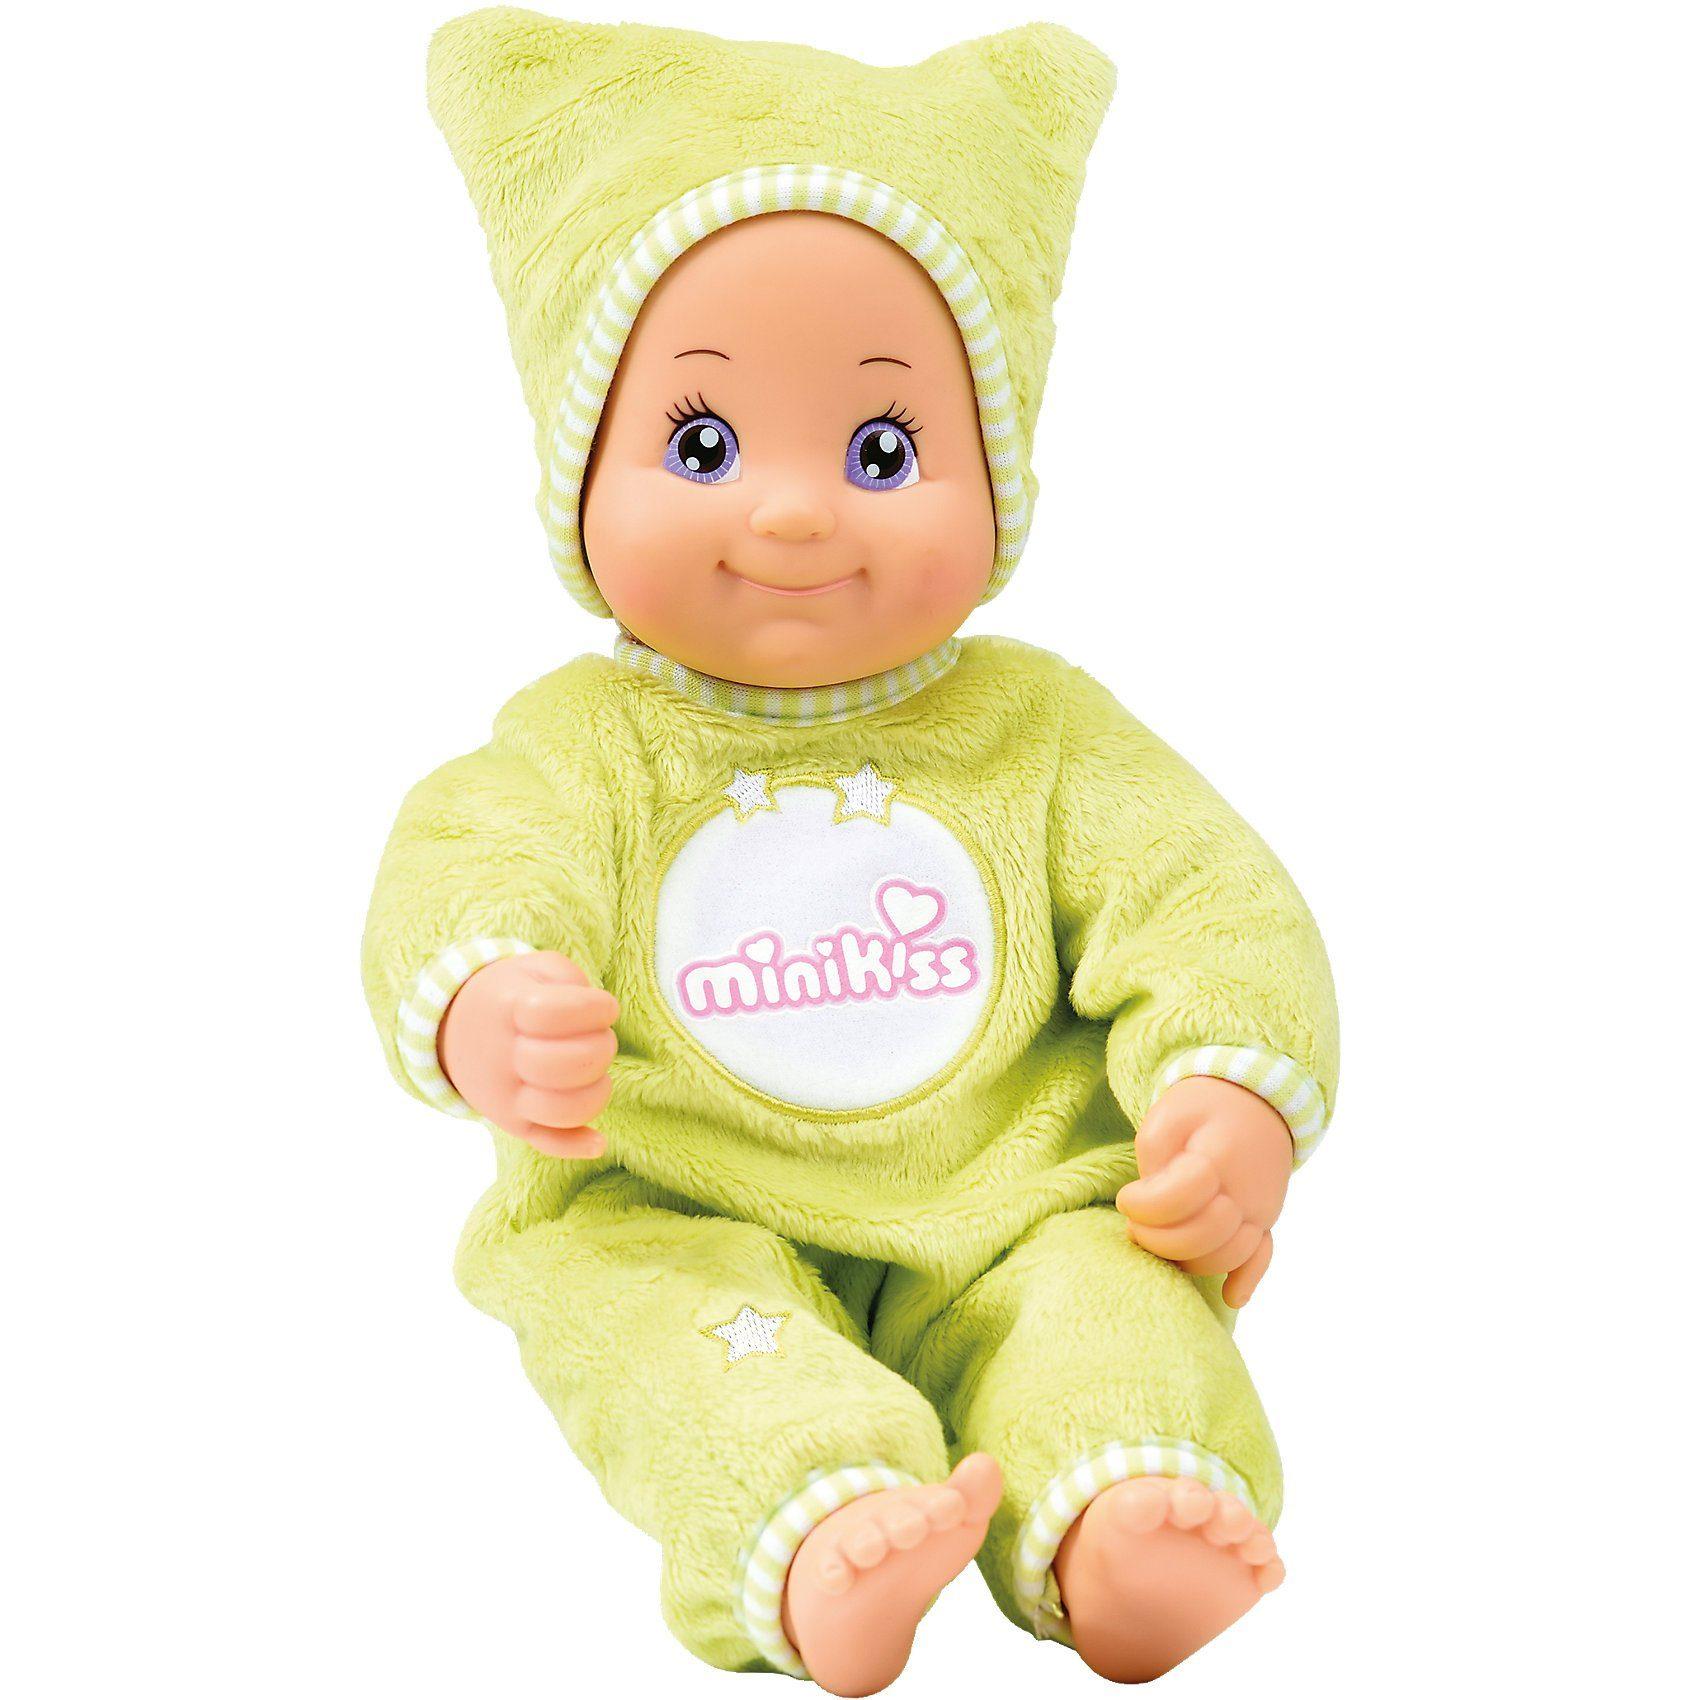 Smoby MiniKiss Dodo Babypuppe, 27 cm